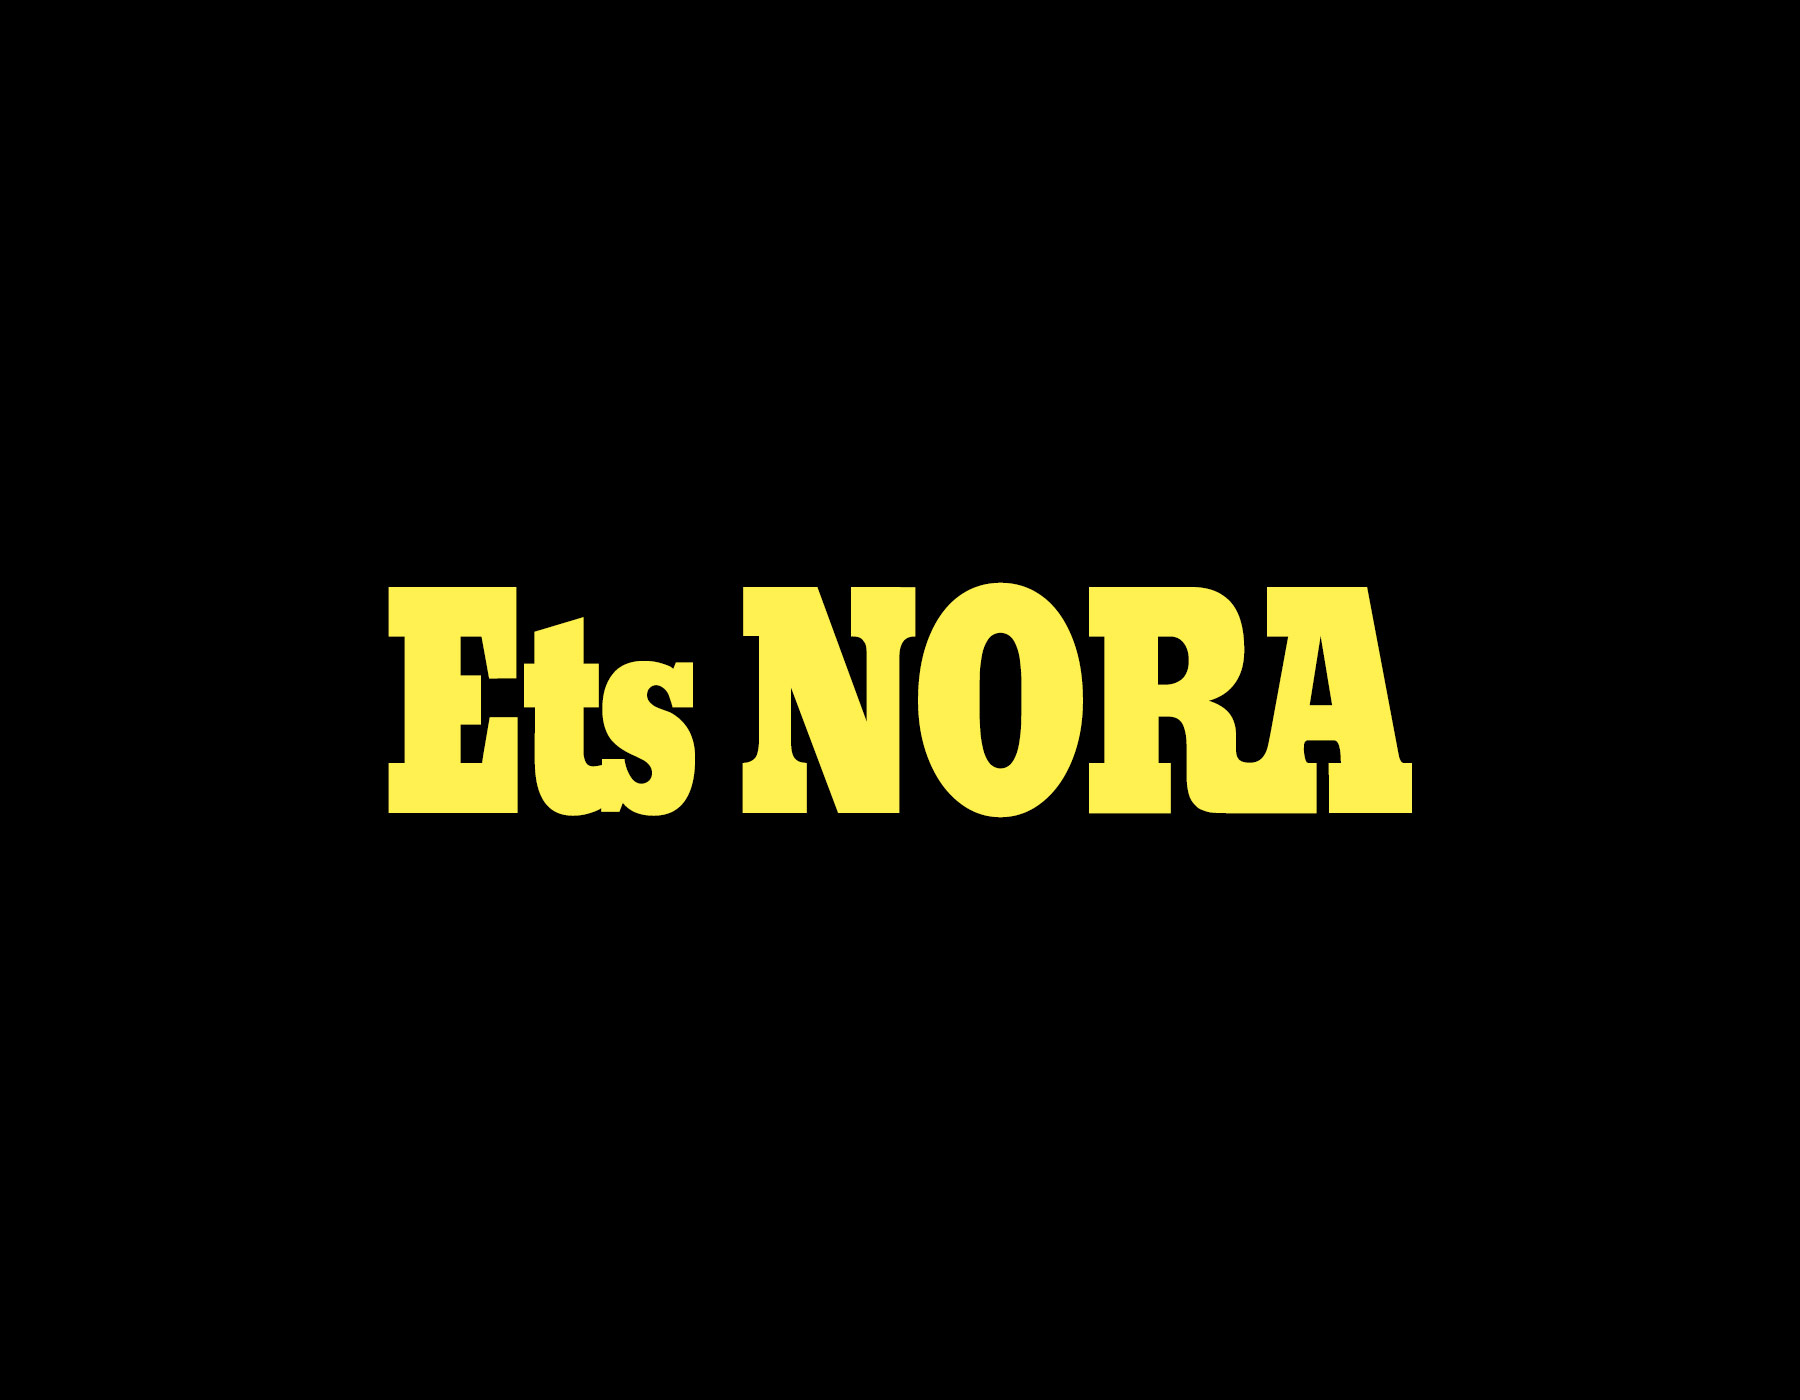 Logo Etablissements Nora